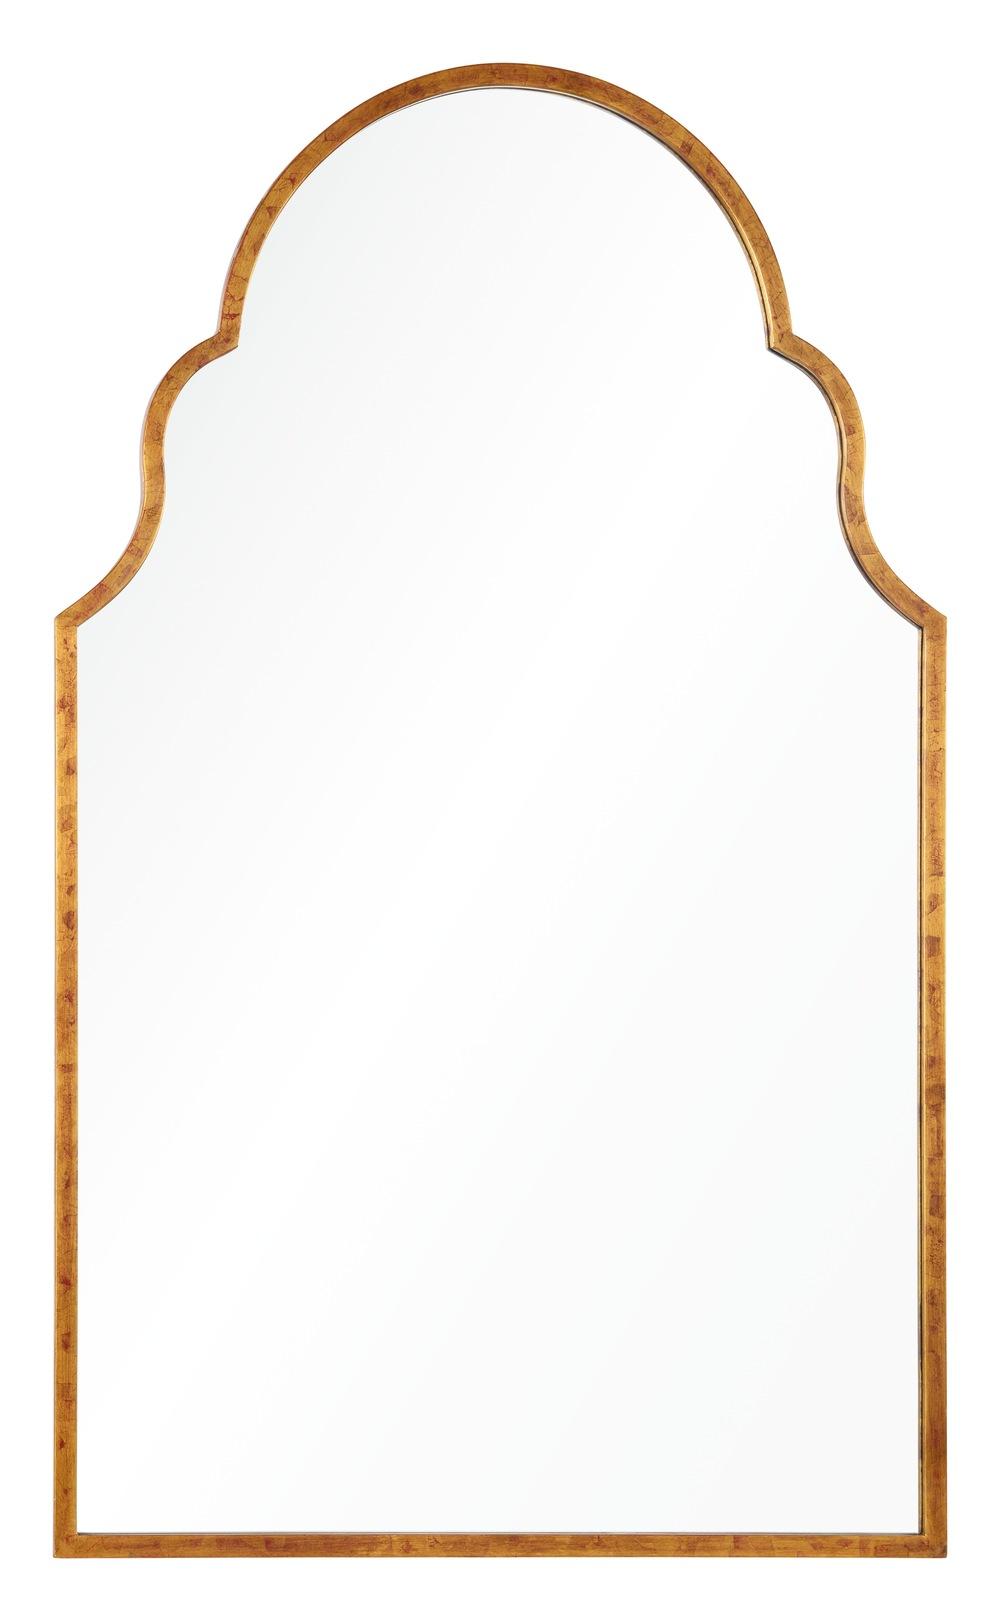 Mirror Image Home - Arched Mirror